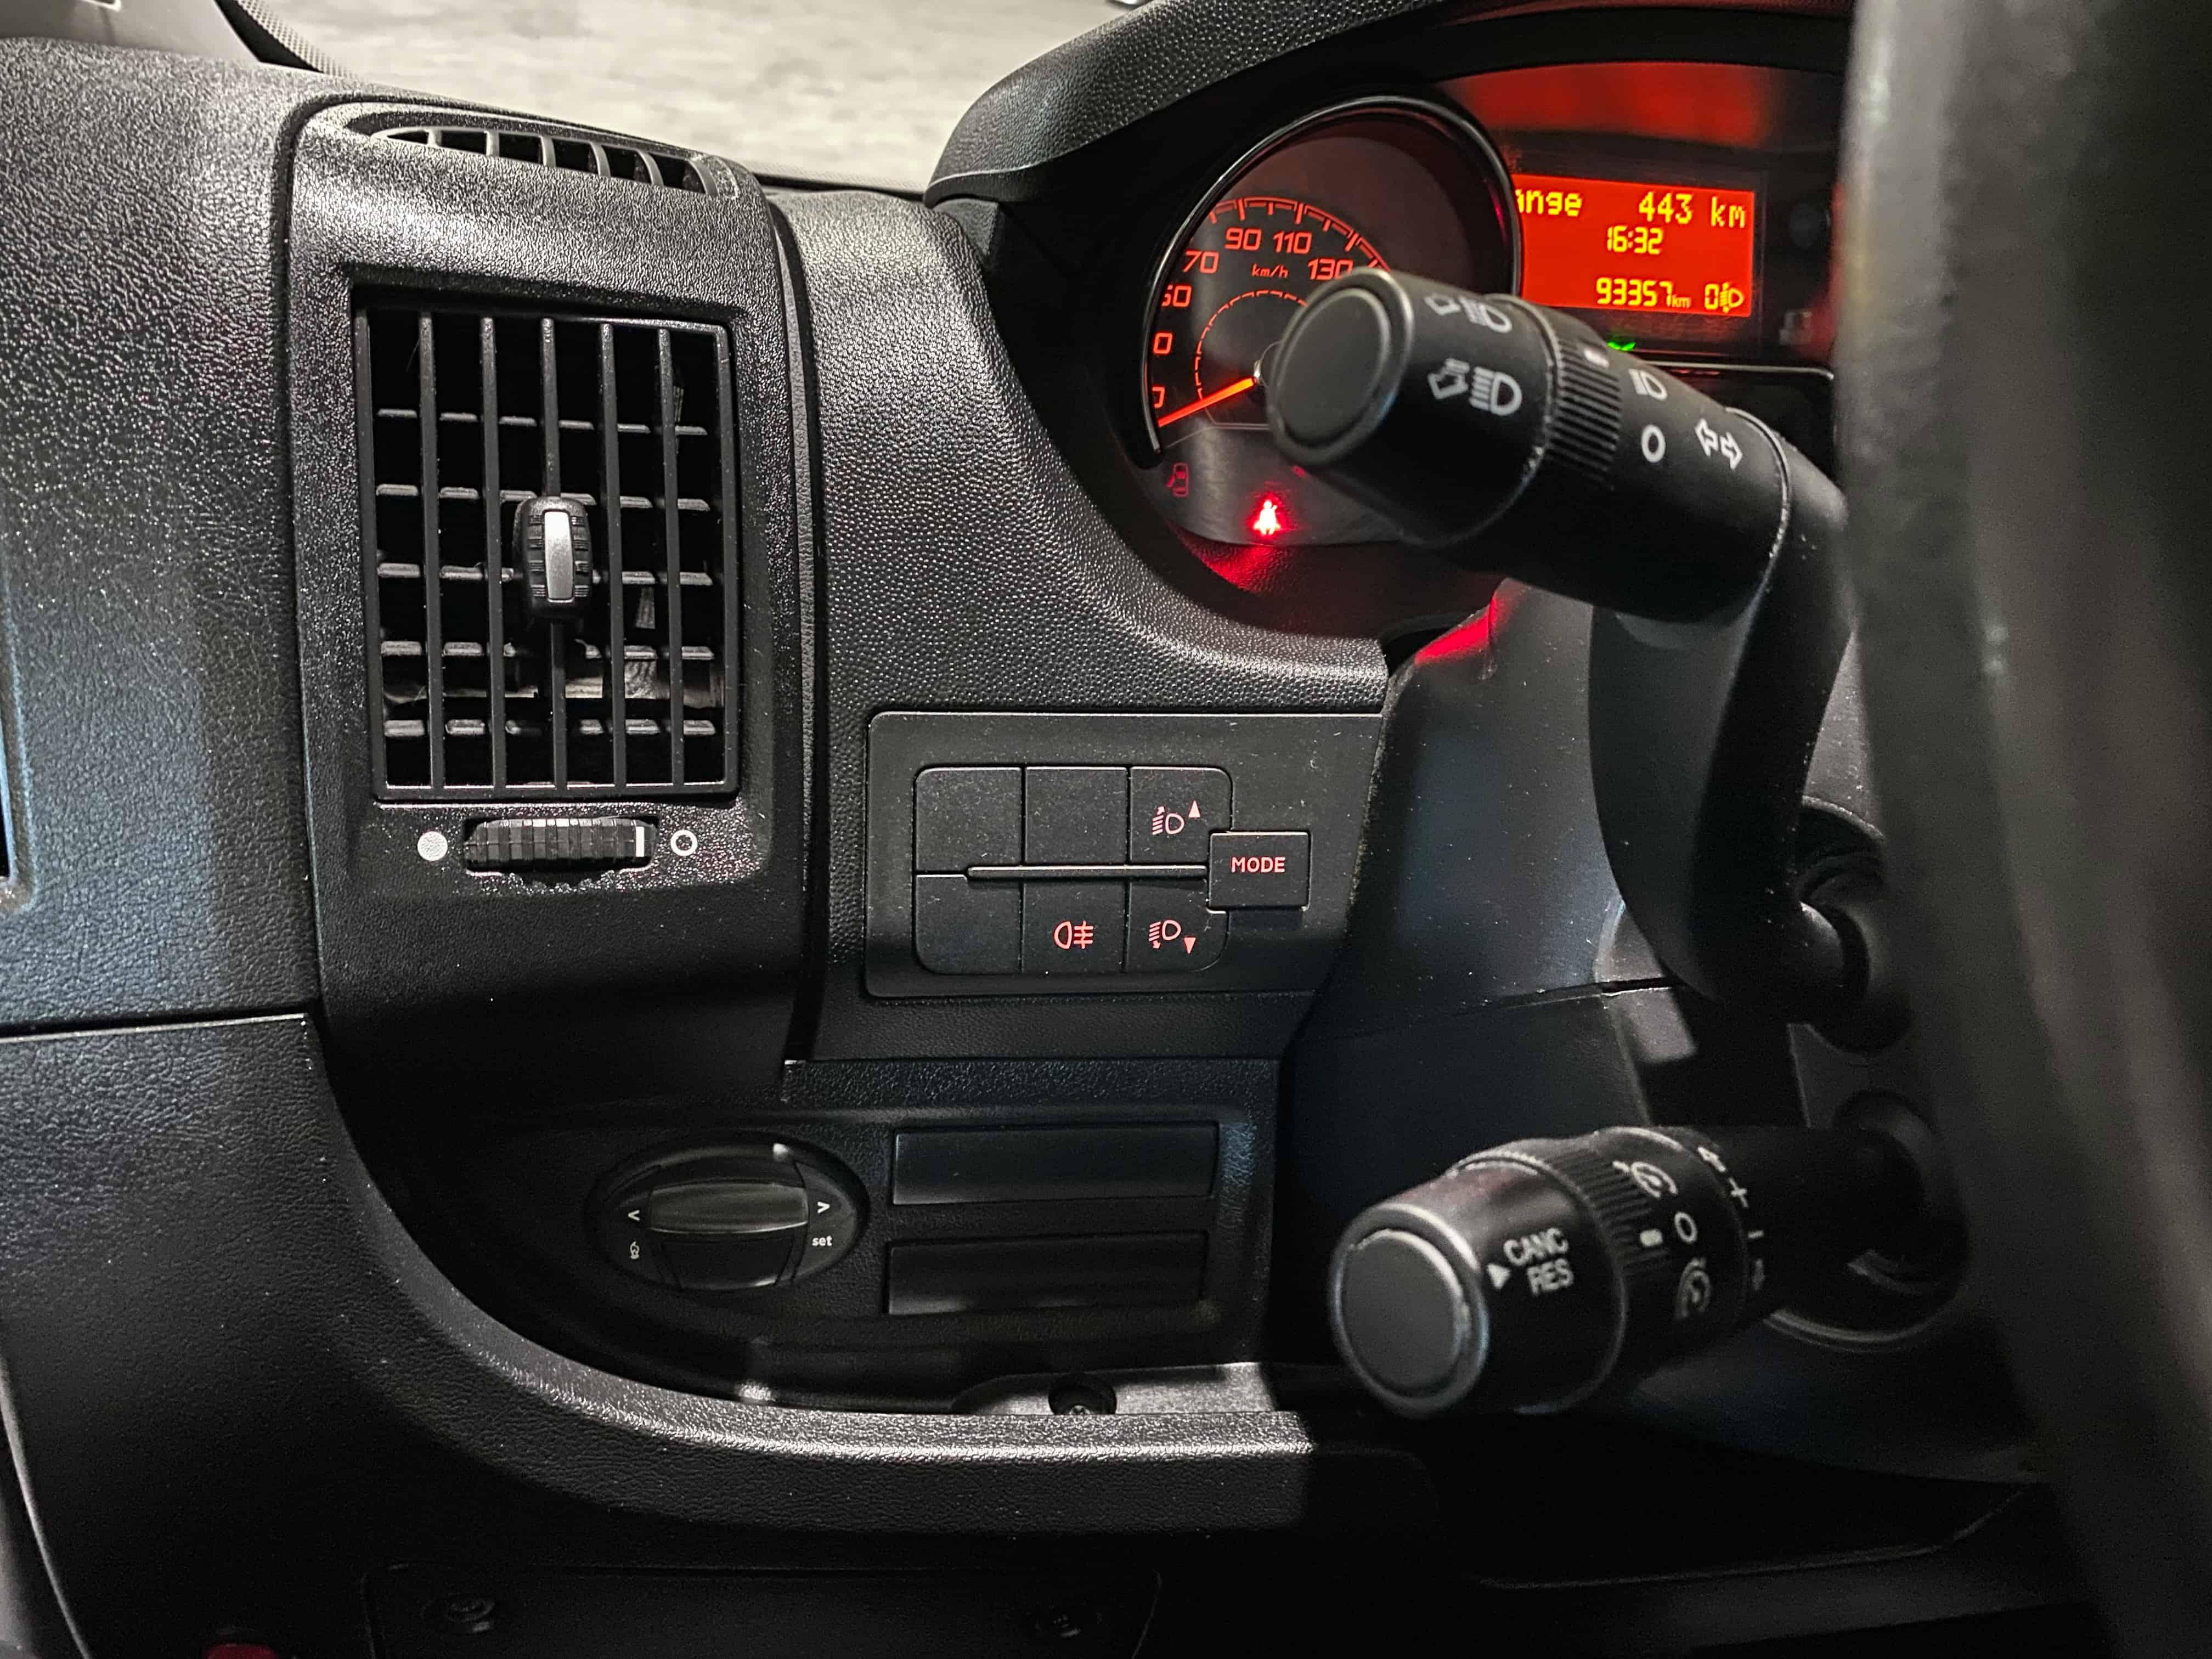 Fiat Ducato MJT 130 Chassis L3